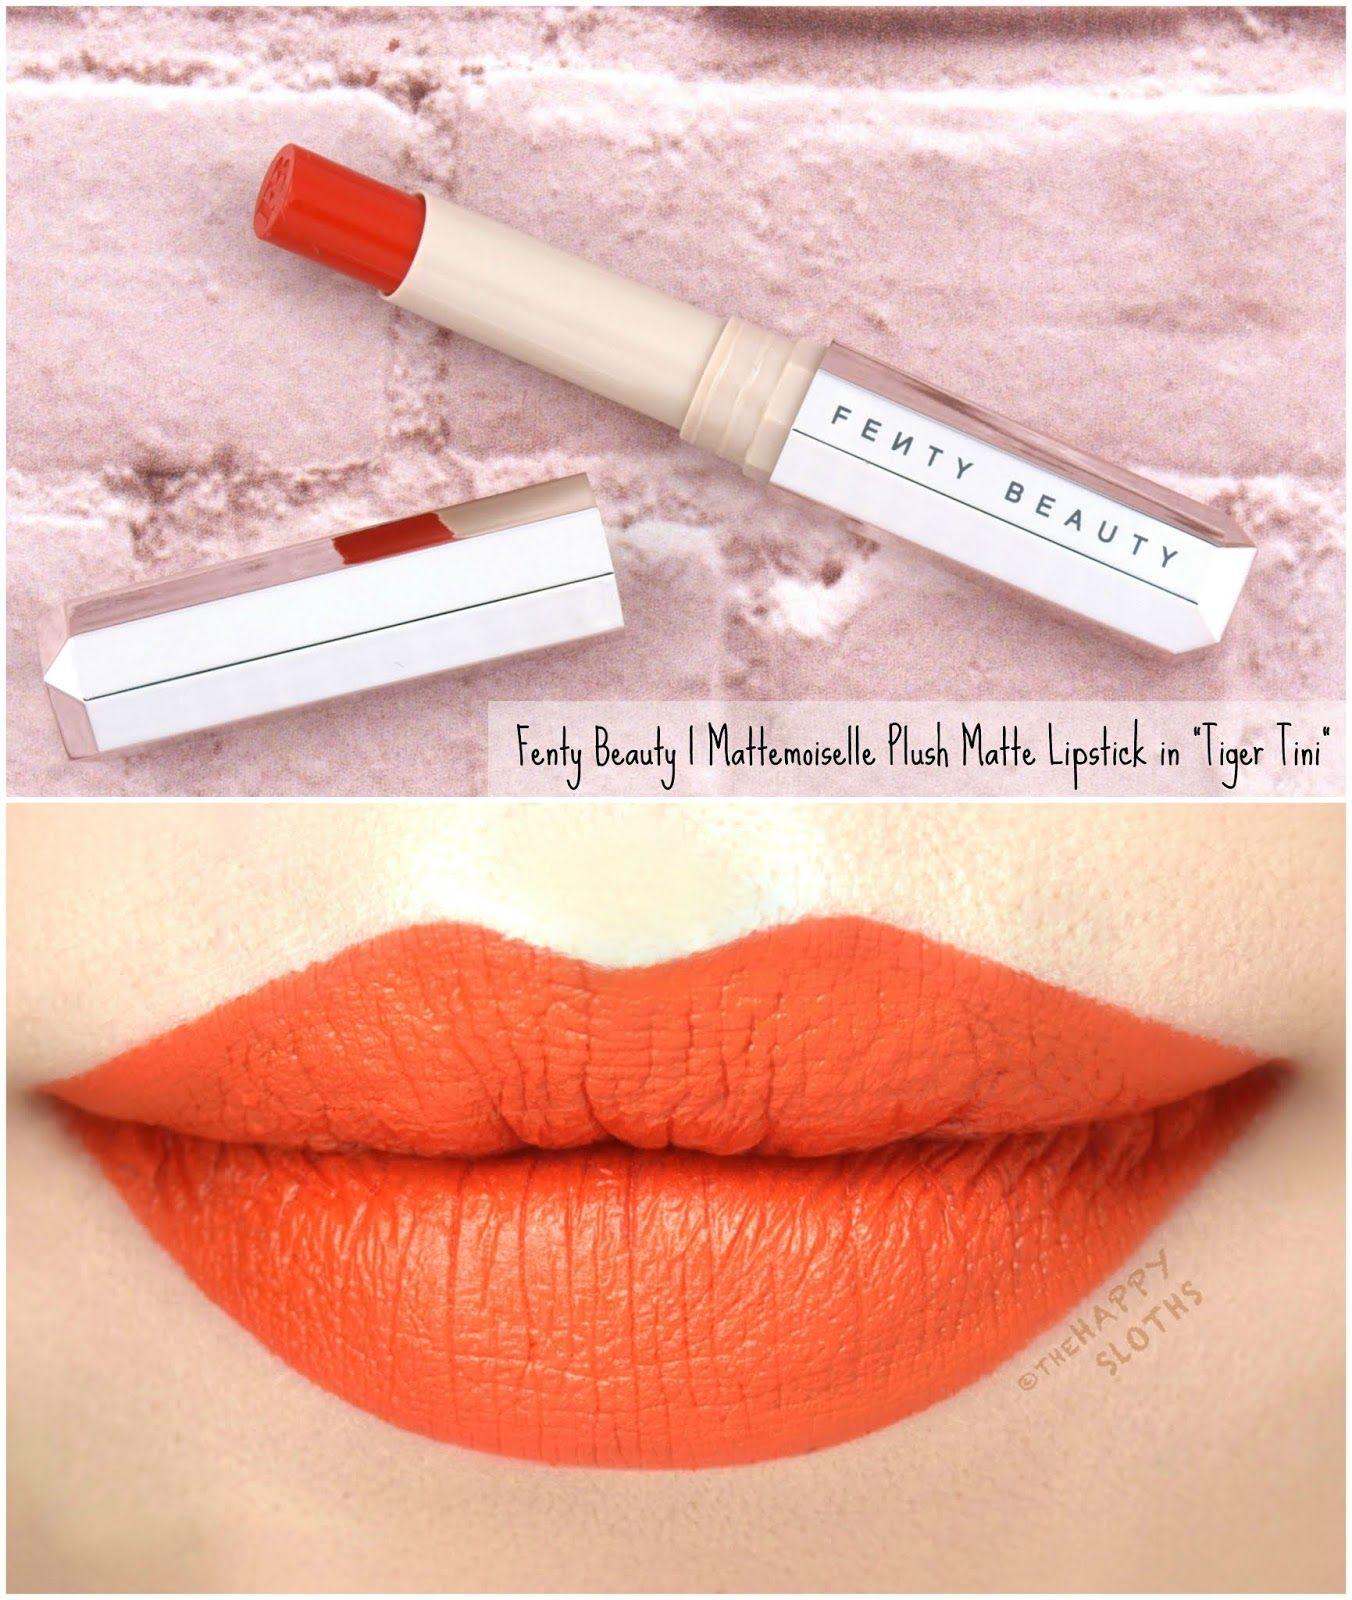 Fenty Beauty By Rihanna New Shades Mattemoiselle Plush Matte Lipstick Review And Swatches Fenty Beauty Lipstick Fenty Makeup